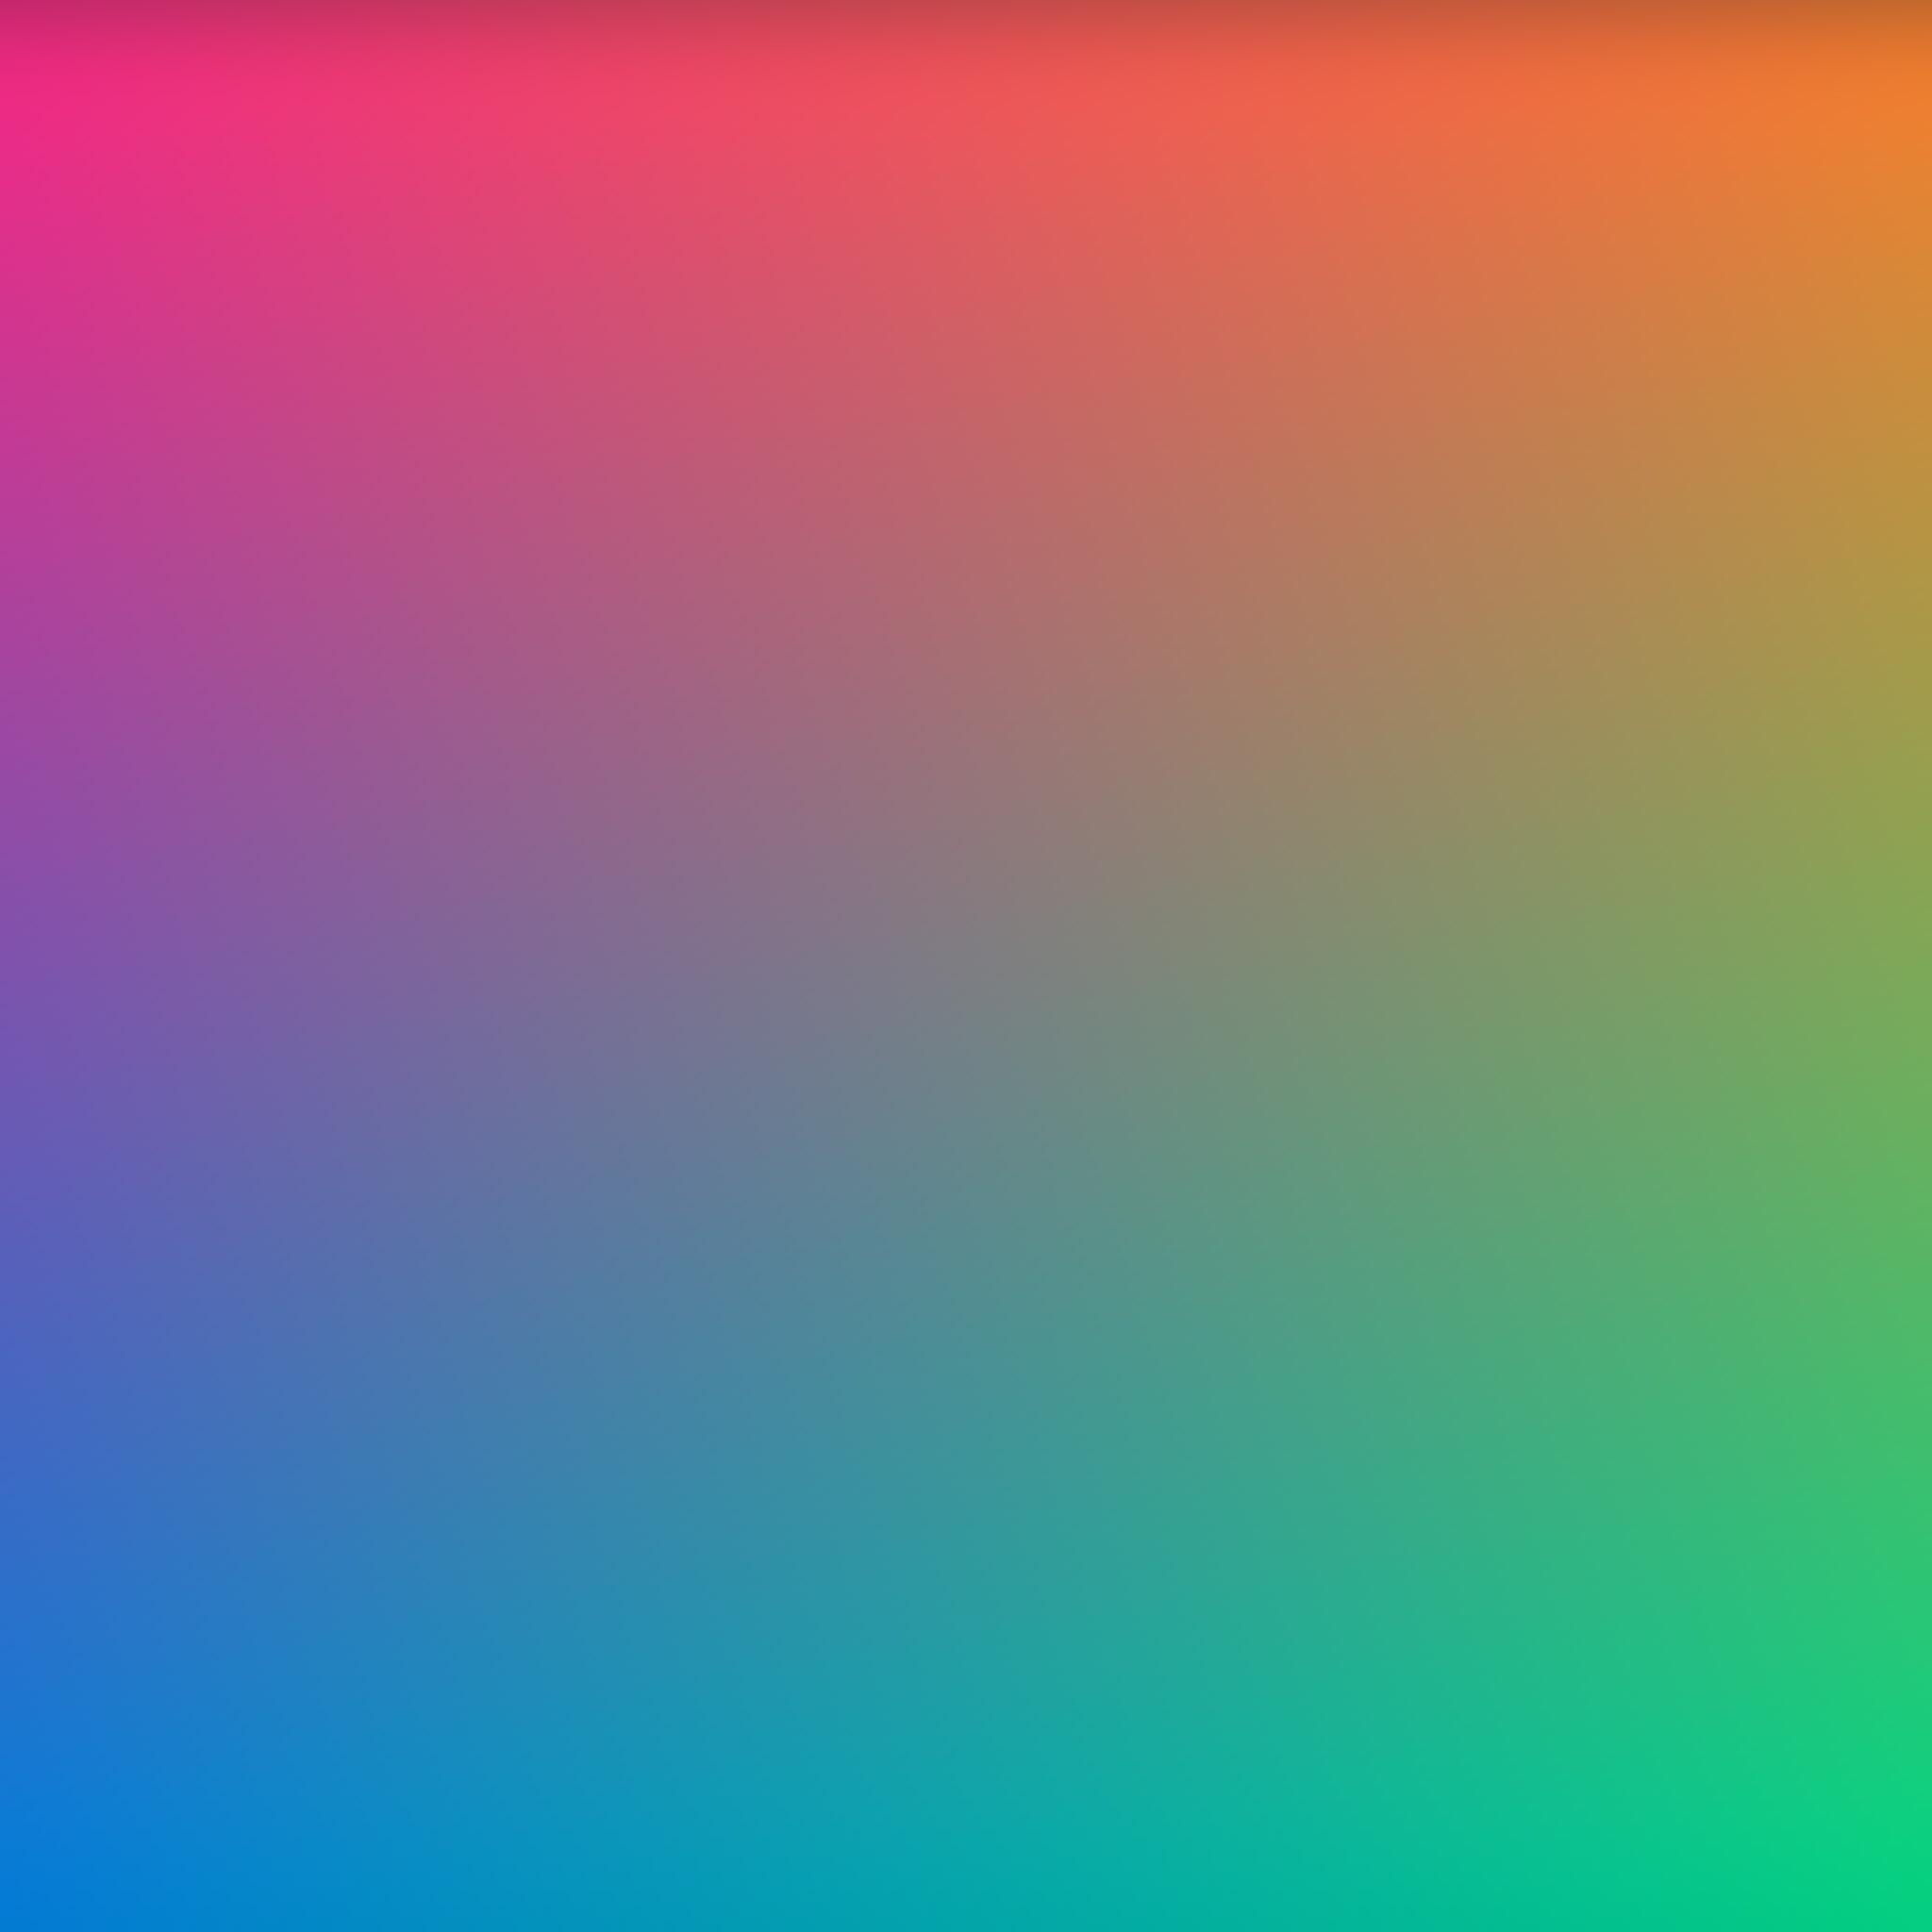 Sl87 Color Rainbow Blur Gradation Wallpaper